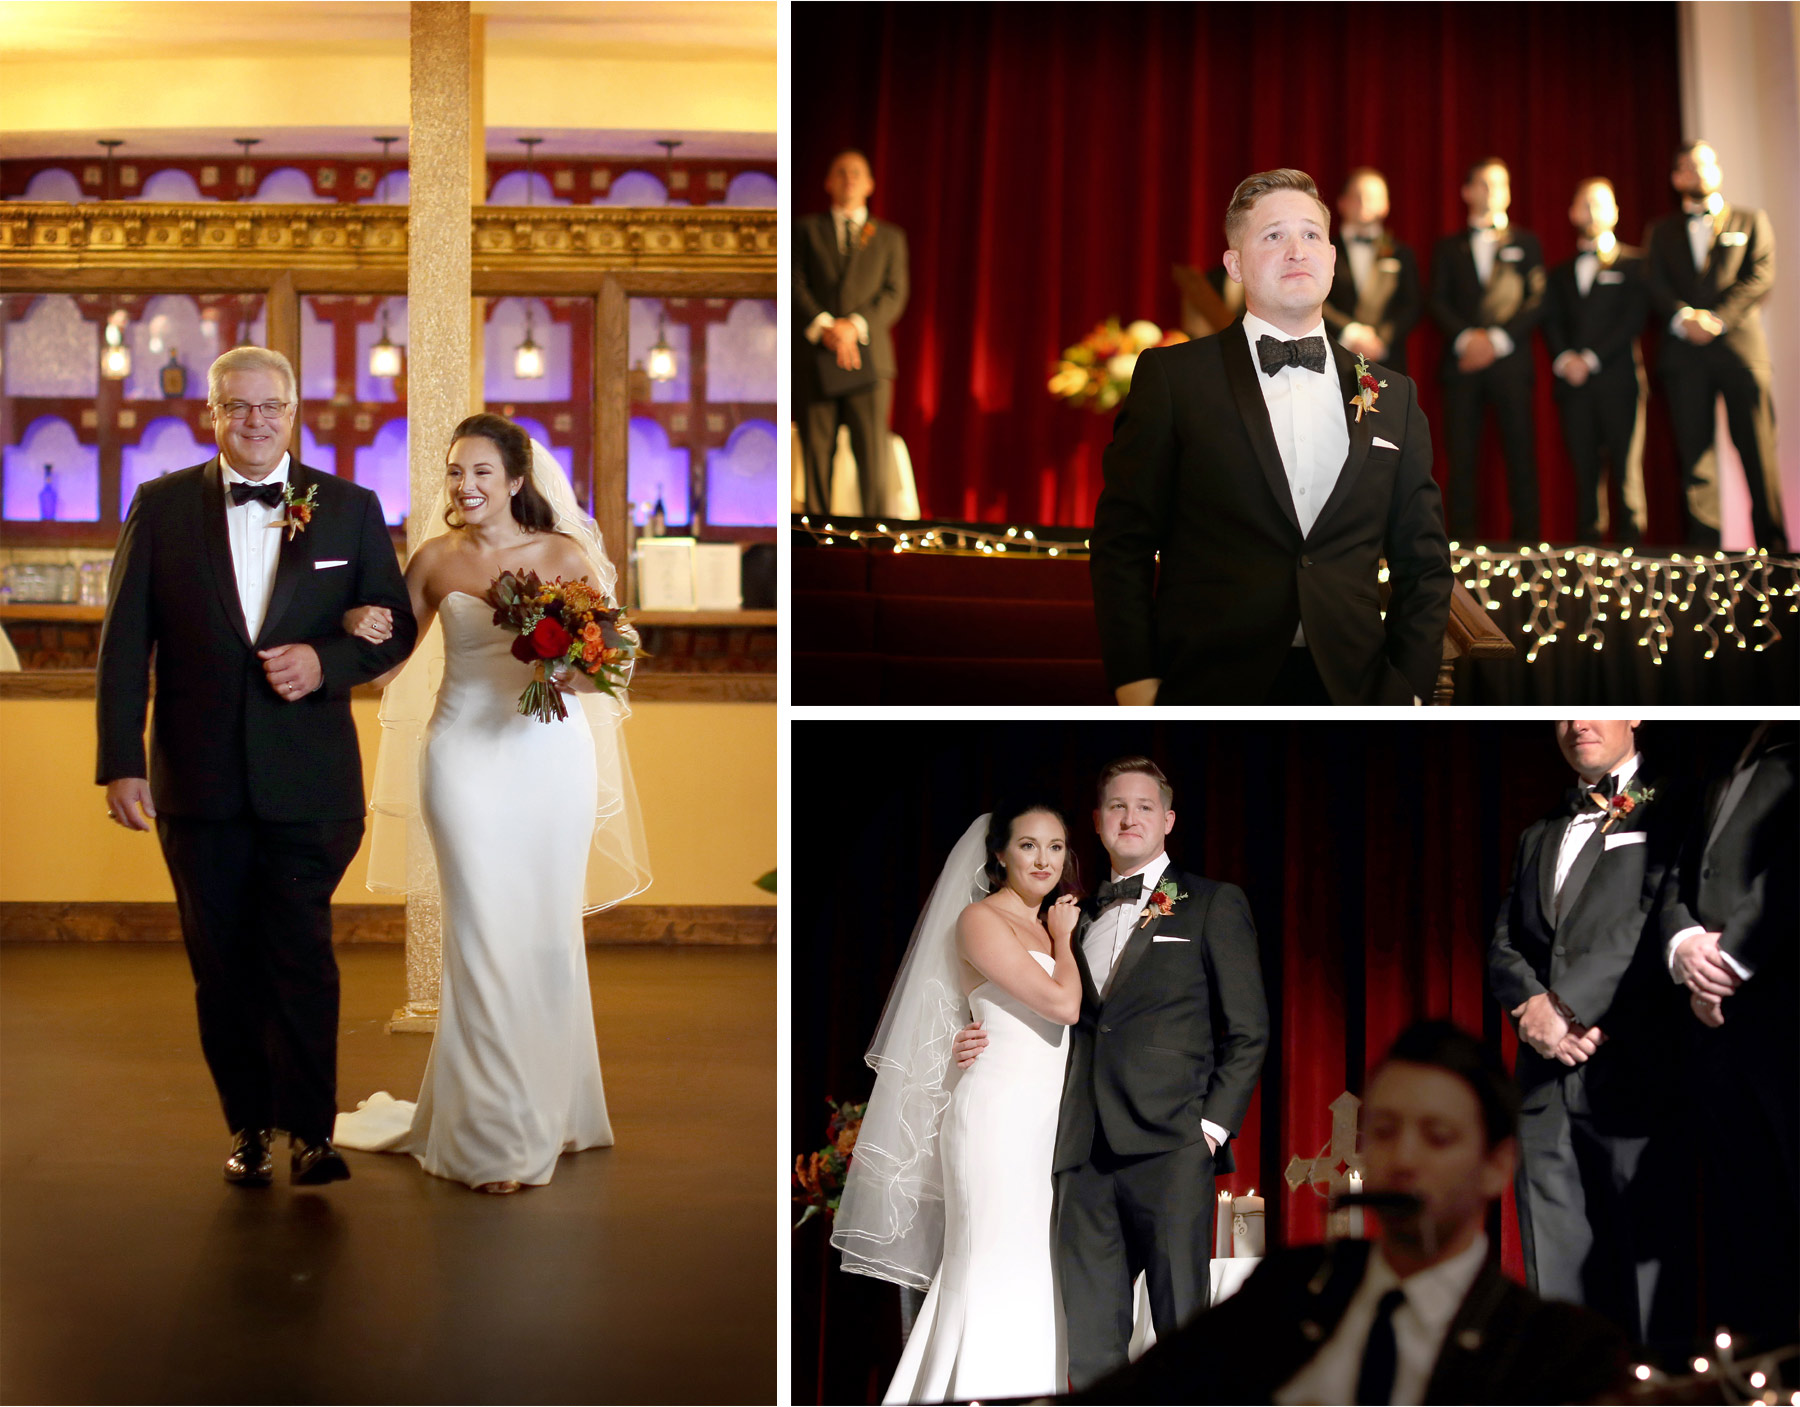 16-Kansas-City-Missouri-Destination-Wedding-Photography-by-Vick-Photography-Madrid-Theatre-Ceremony-Carly-and-Kenny.jpg